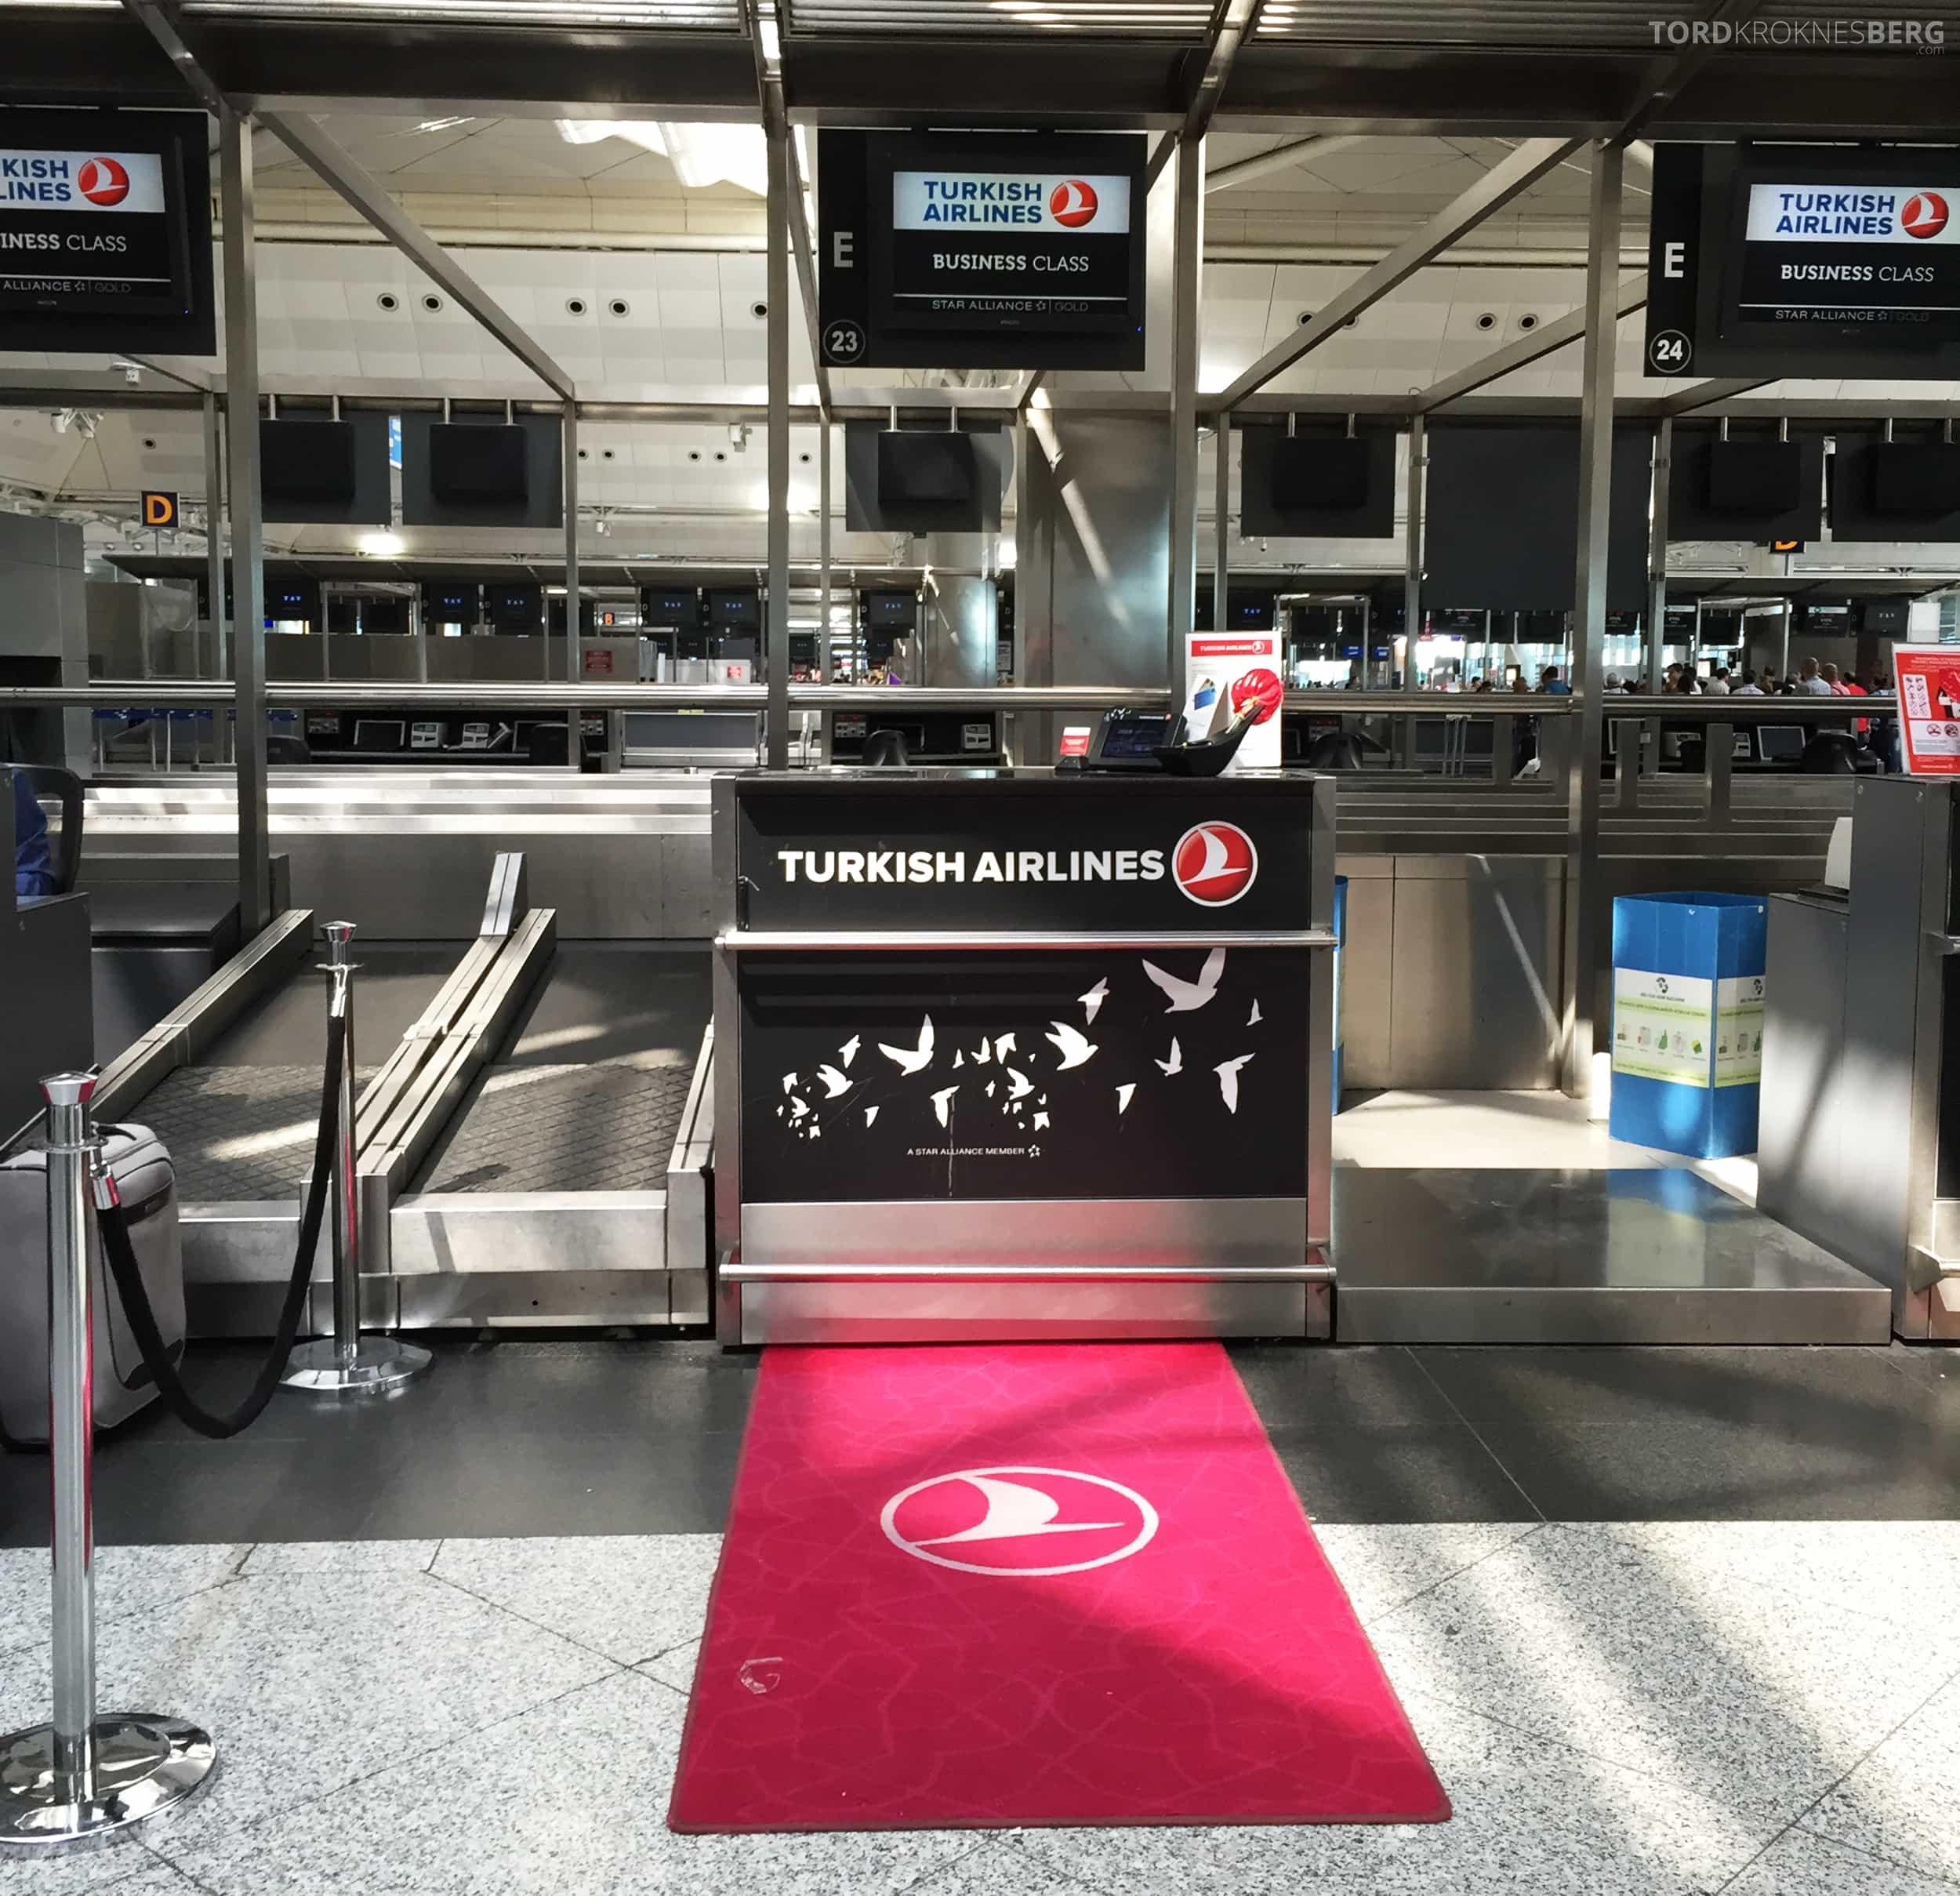 Turkish Airlines Business Class Boston innsjekk